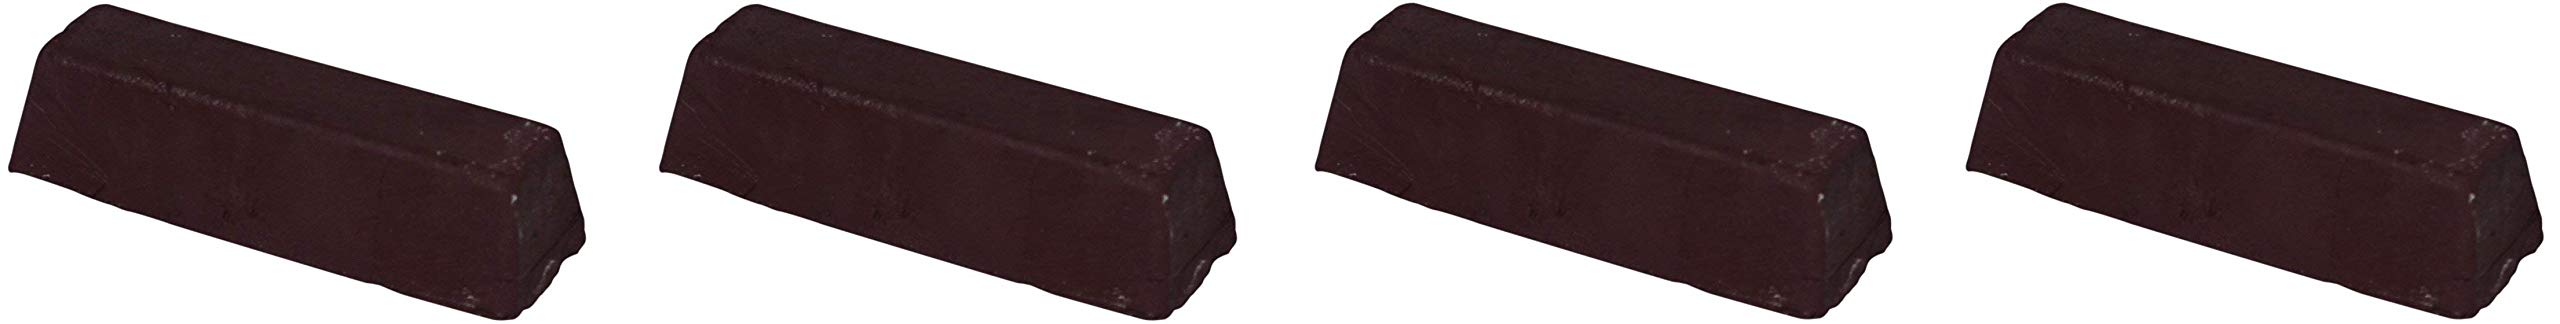 JacksonLea 47351SP Brown Buffing Compound, Grande Bar, 2'' Width x 2'' Height x 9'' Length (Fоur Расk)